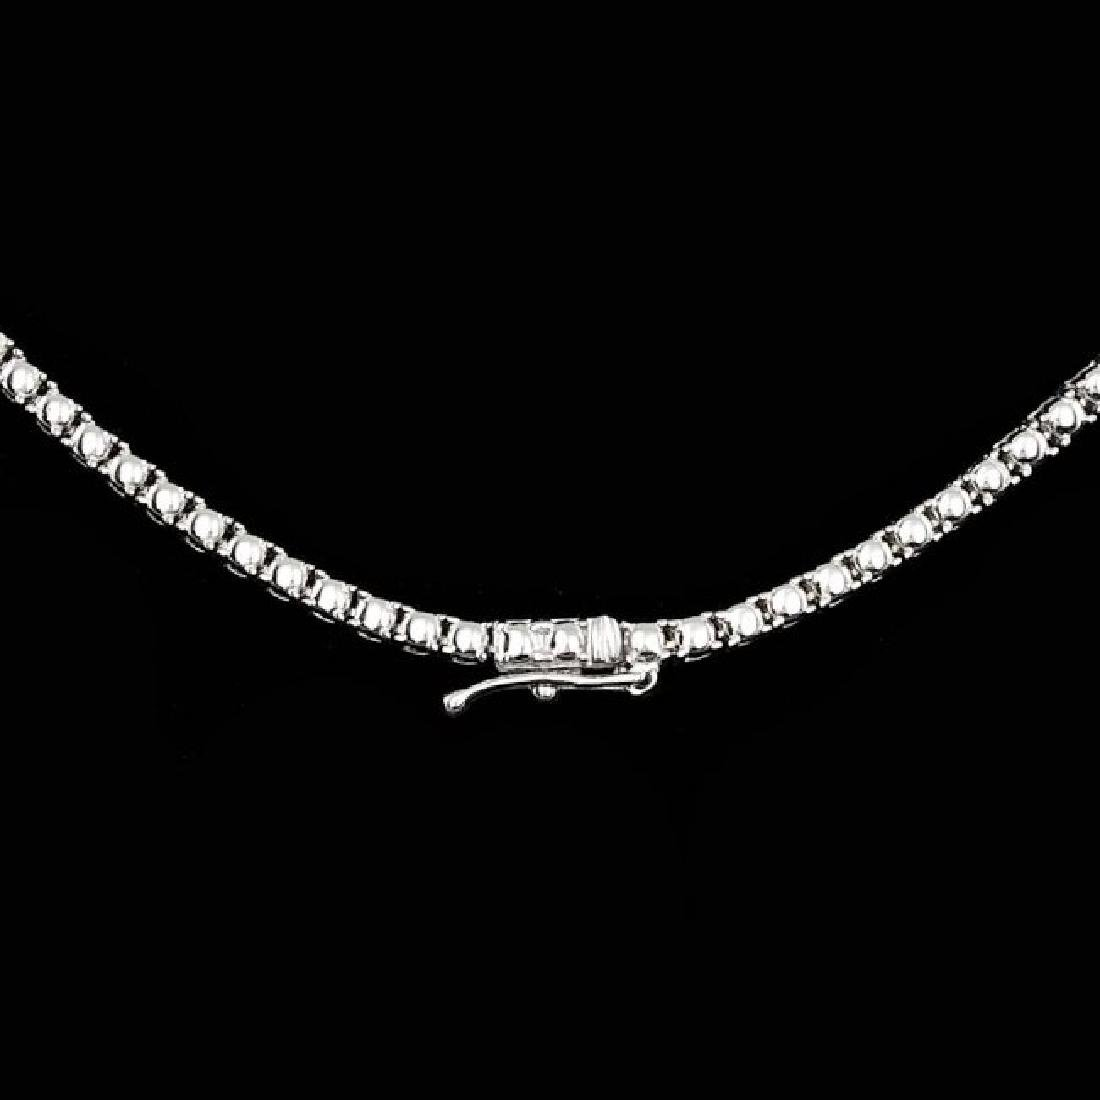 18k White Gold 12.60ct Diamond Necklace - 3